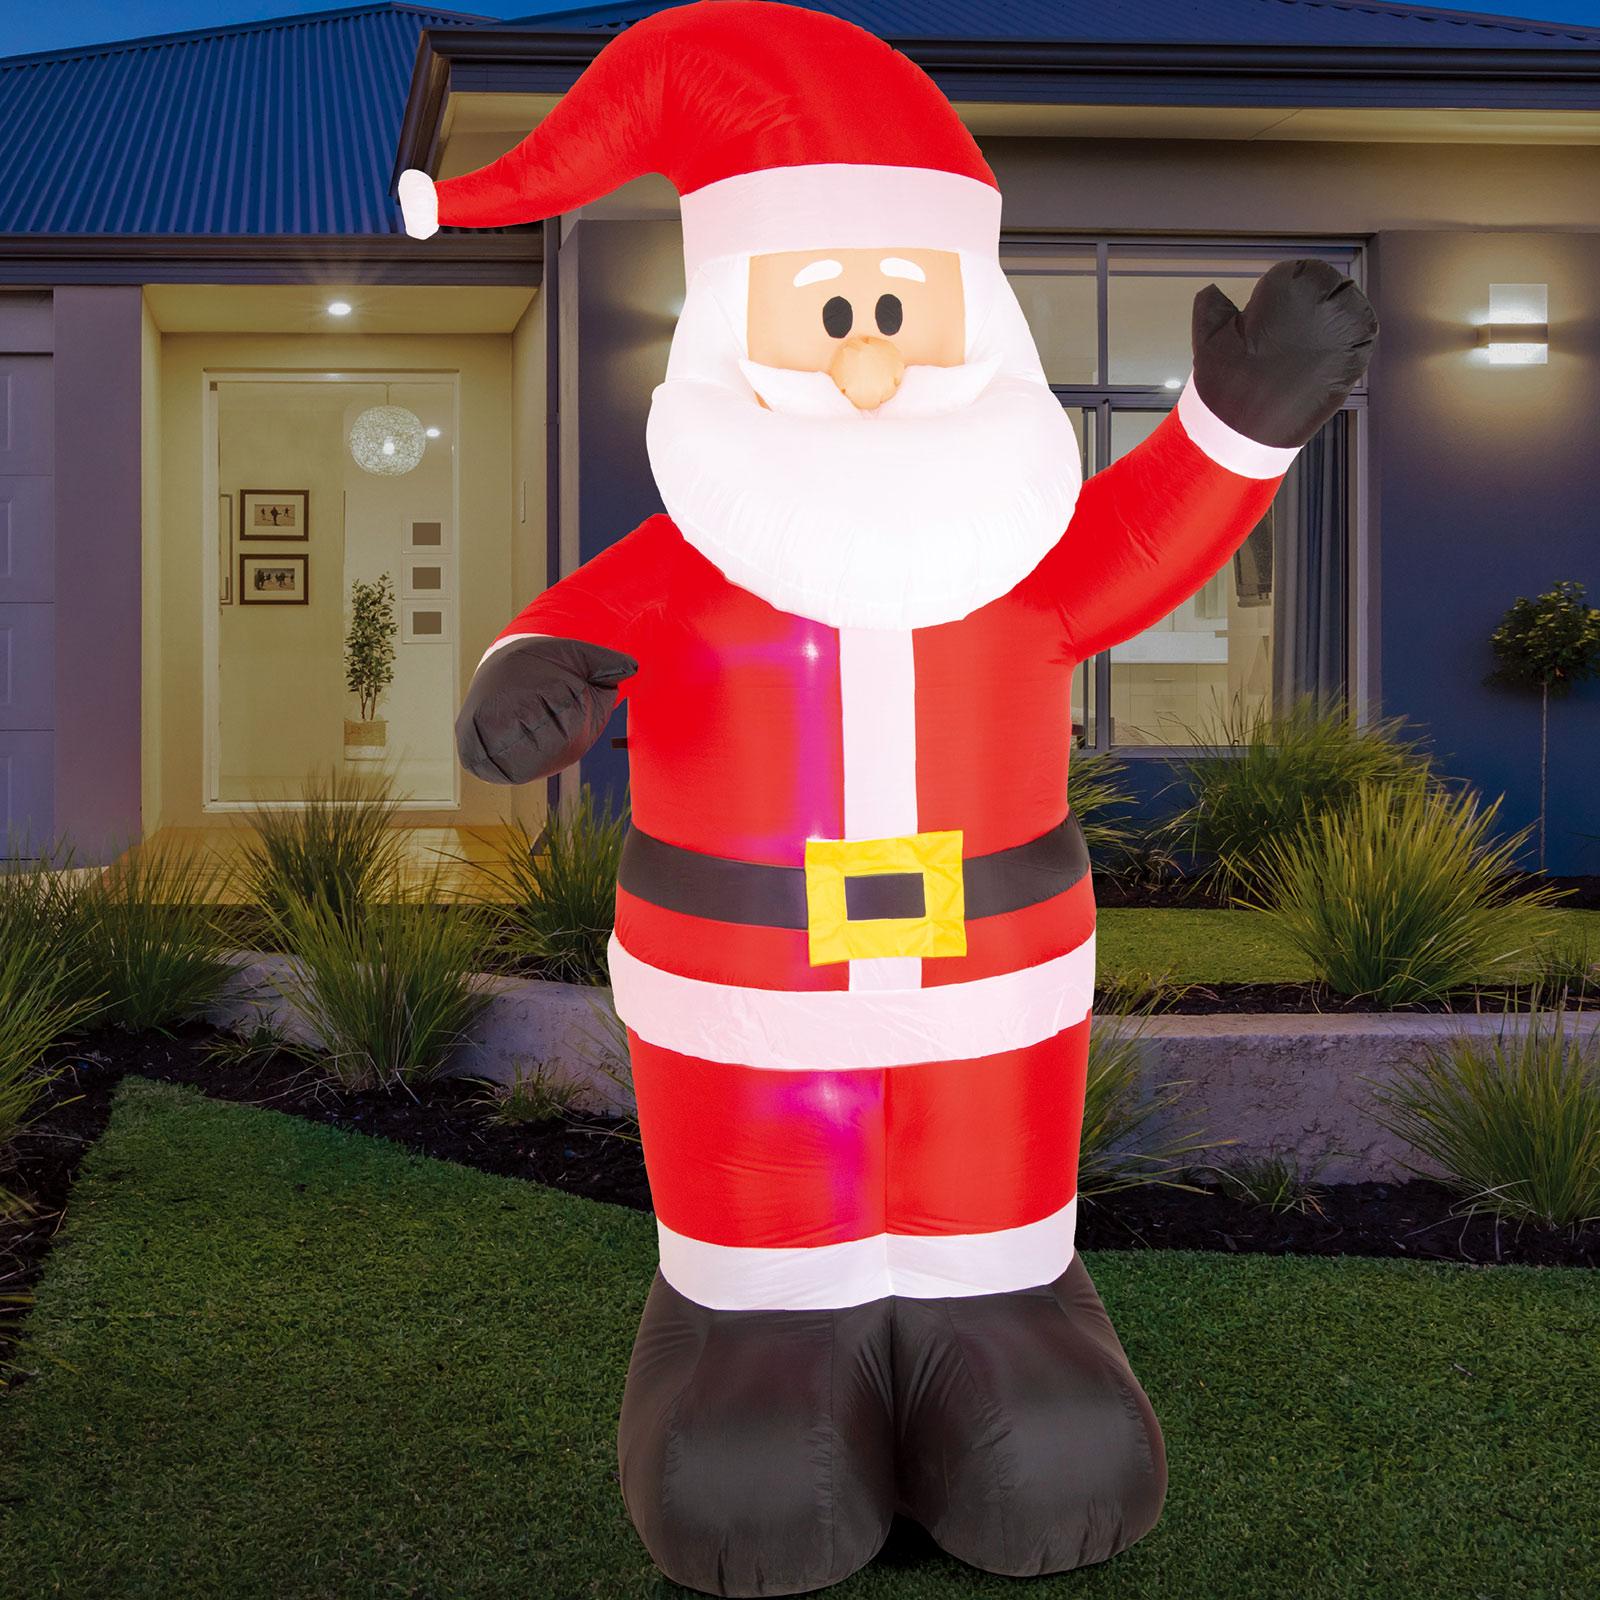 AIRPOWER WAVING SANTA Xmas Inflatable Outdoor Decor Lights Up 1 Piece 2.4m